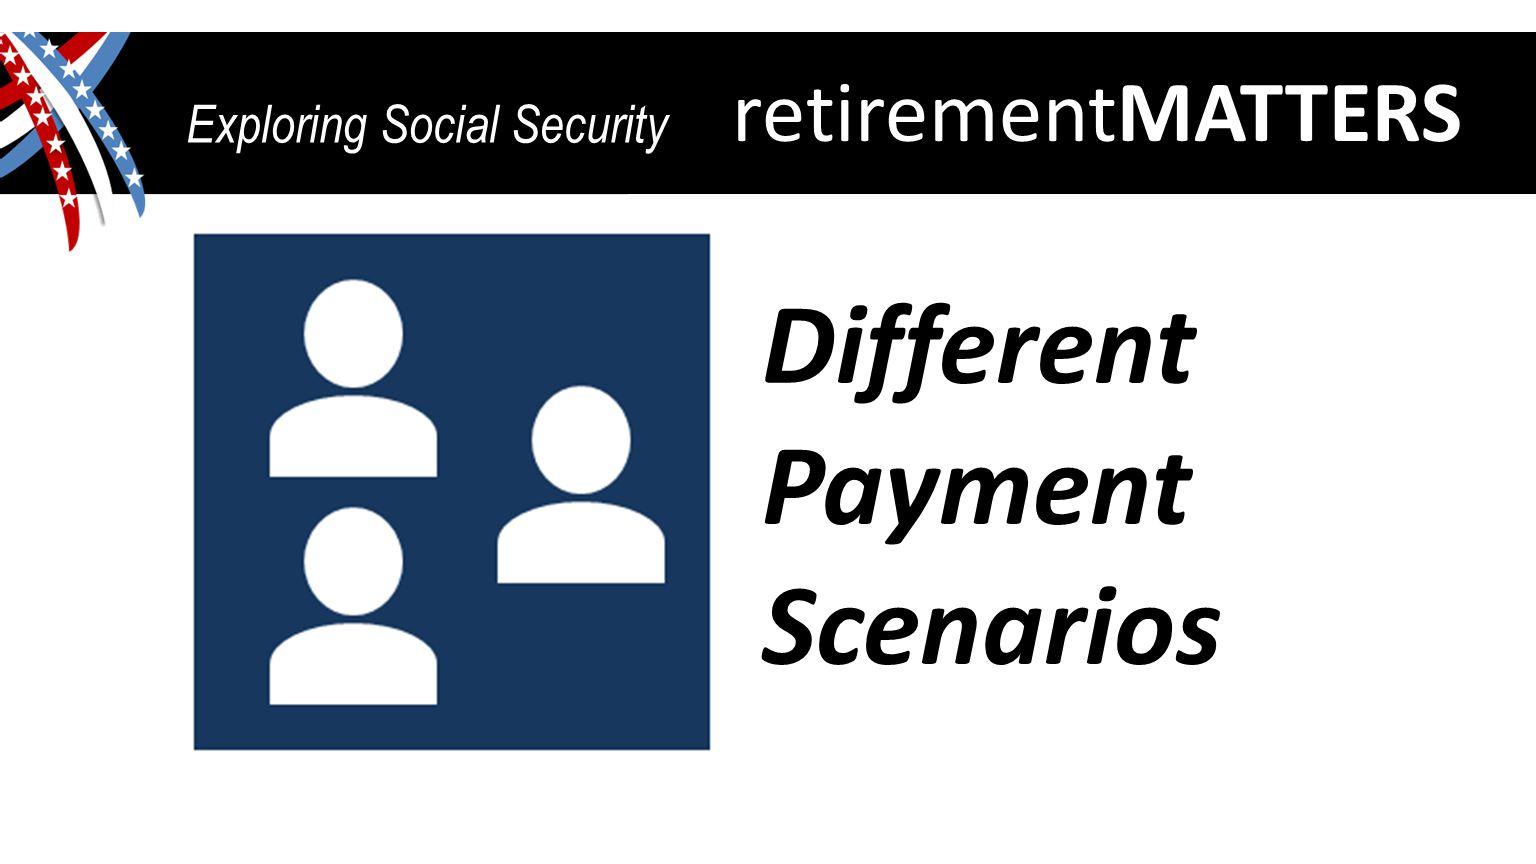 retirementMATTERS Exploring Social Security Different Payment Scenarios